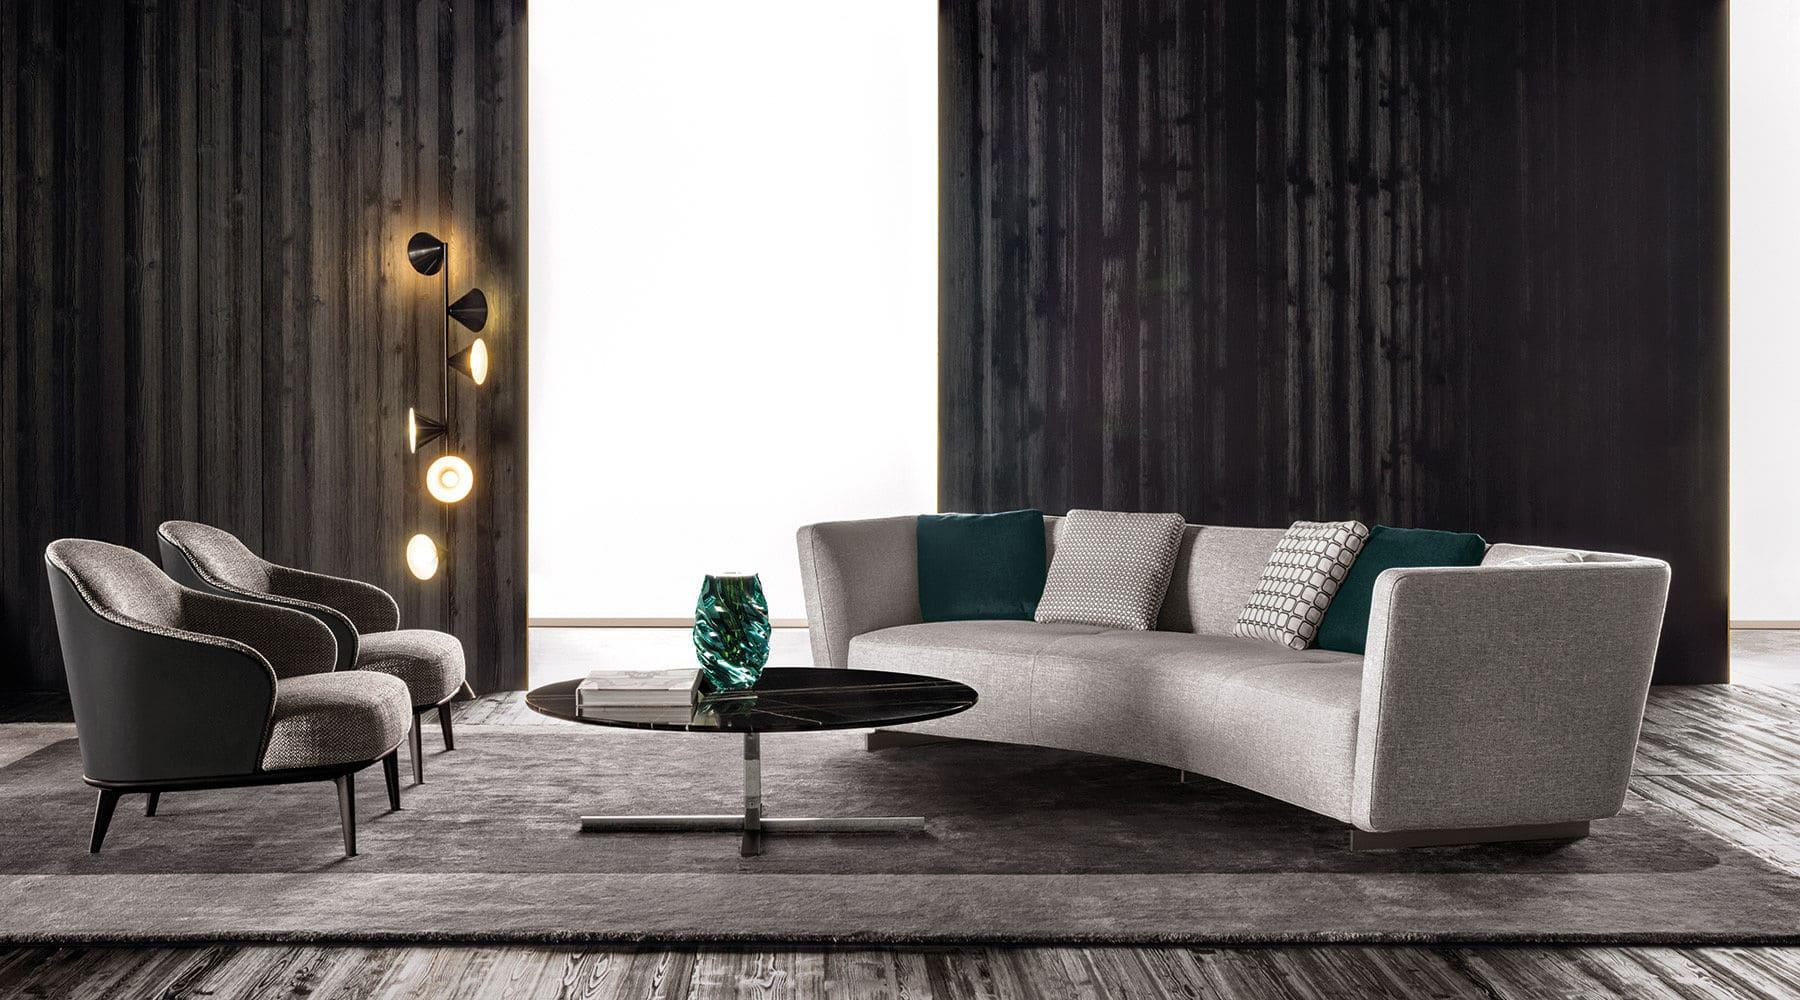 Sfera design Minotti soft furniture Lounge Seymour